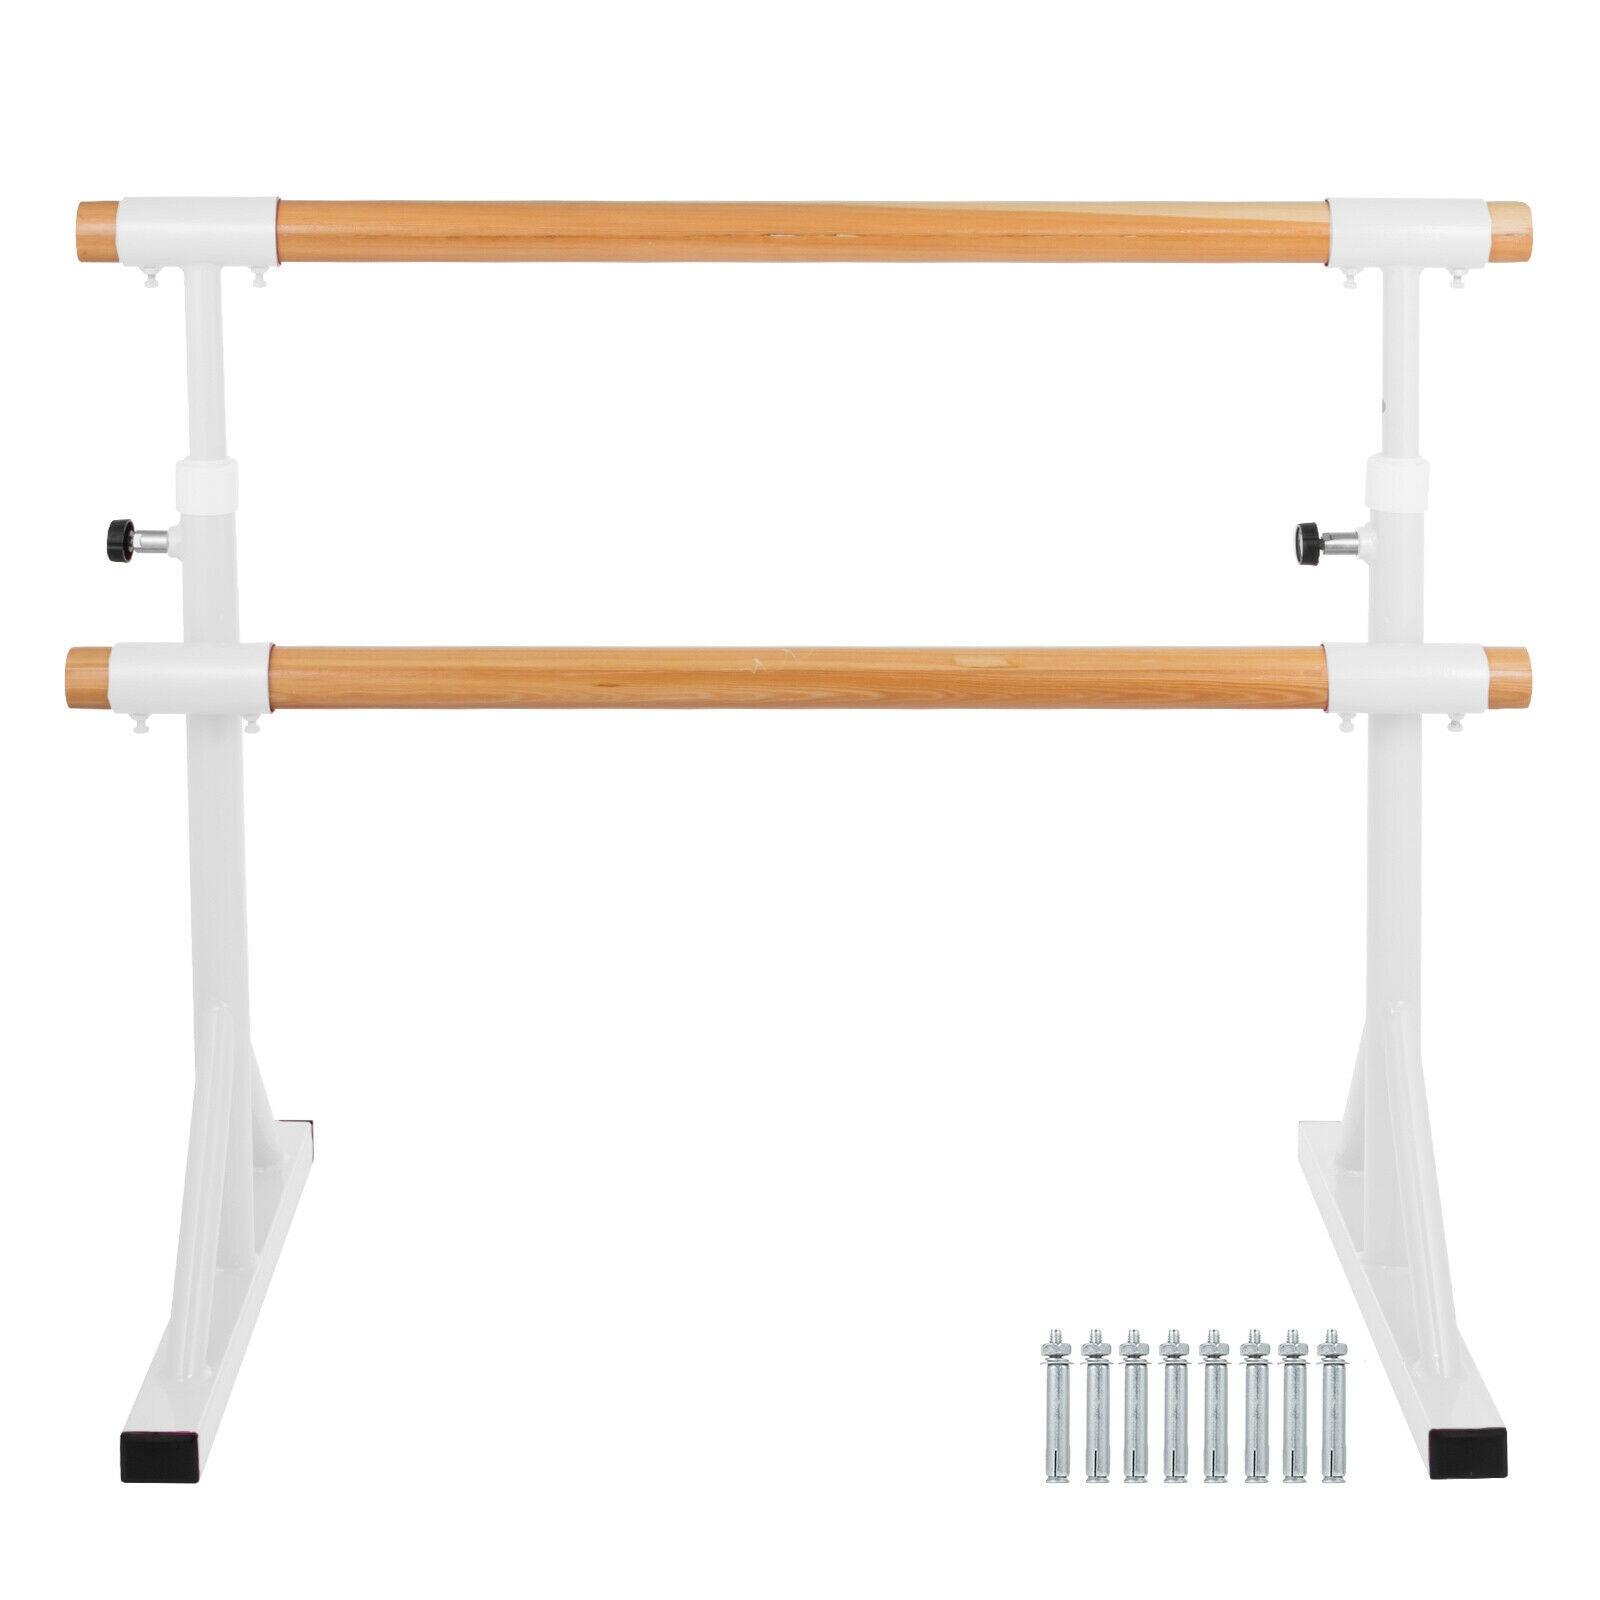 4FT Ballet Barre Portable Double Freestanding Stretch Dance Bar Adjustable Home